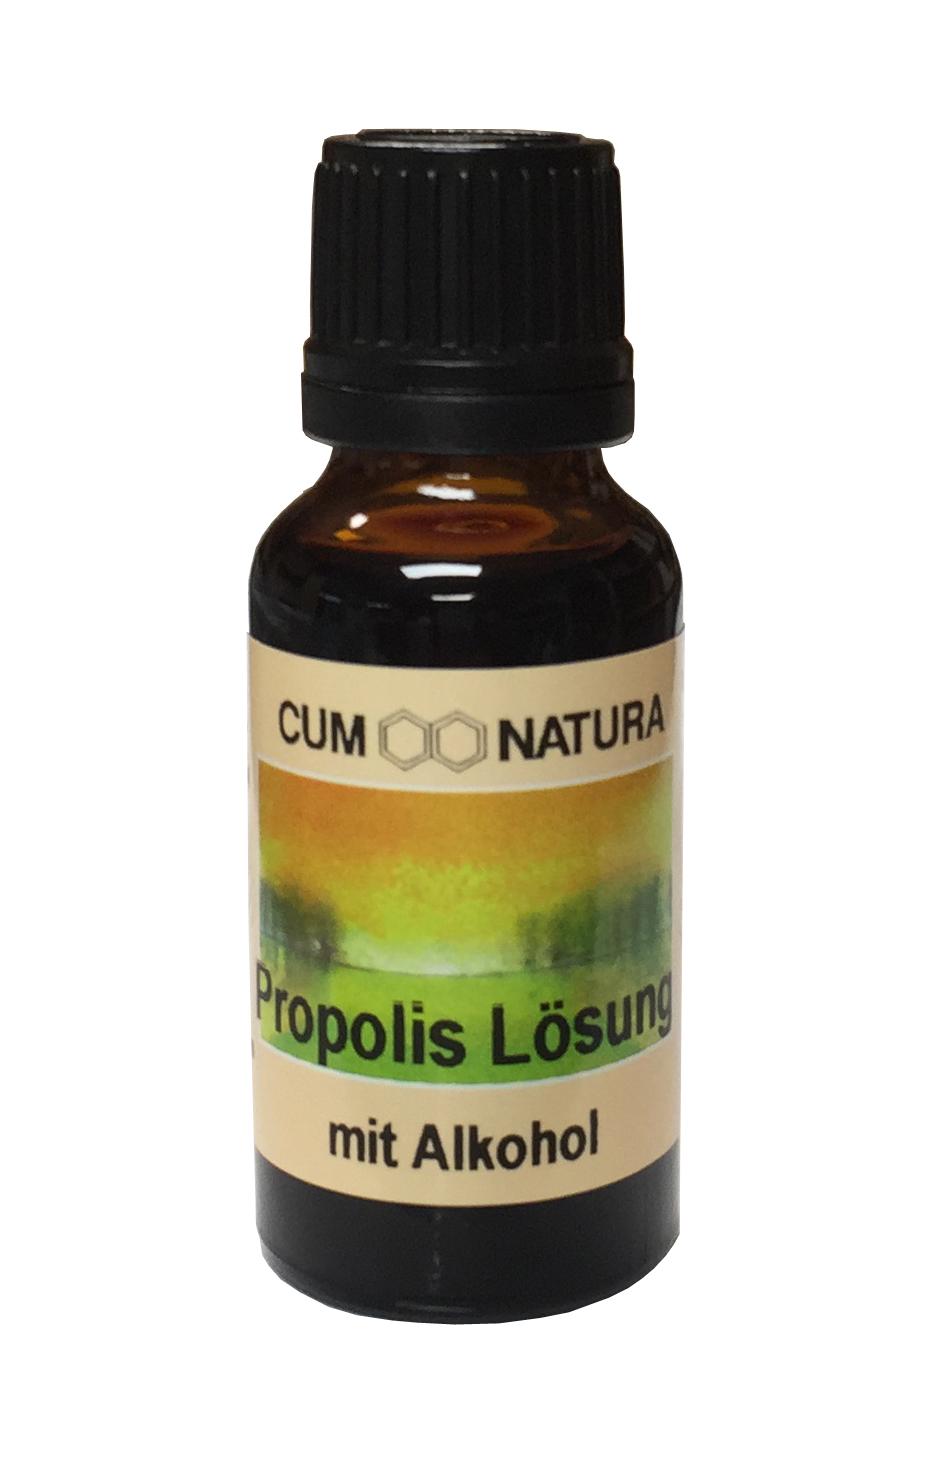 Propolis Lösung mit Alkohol 20 ml